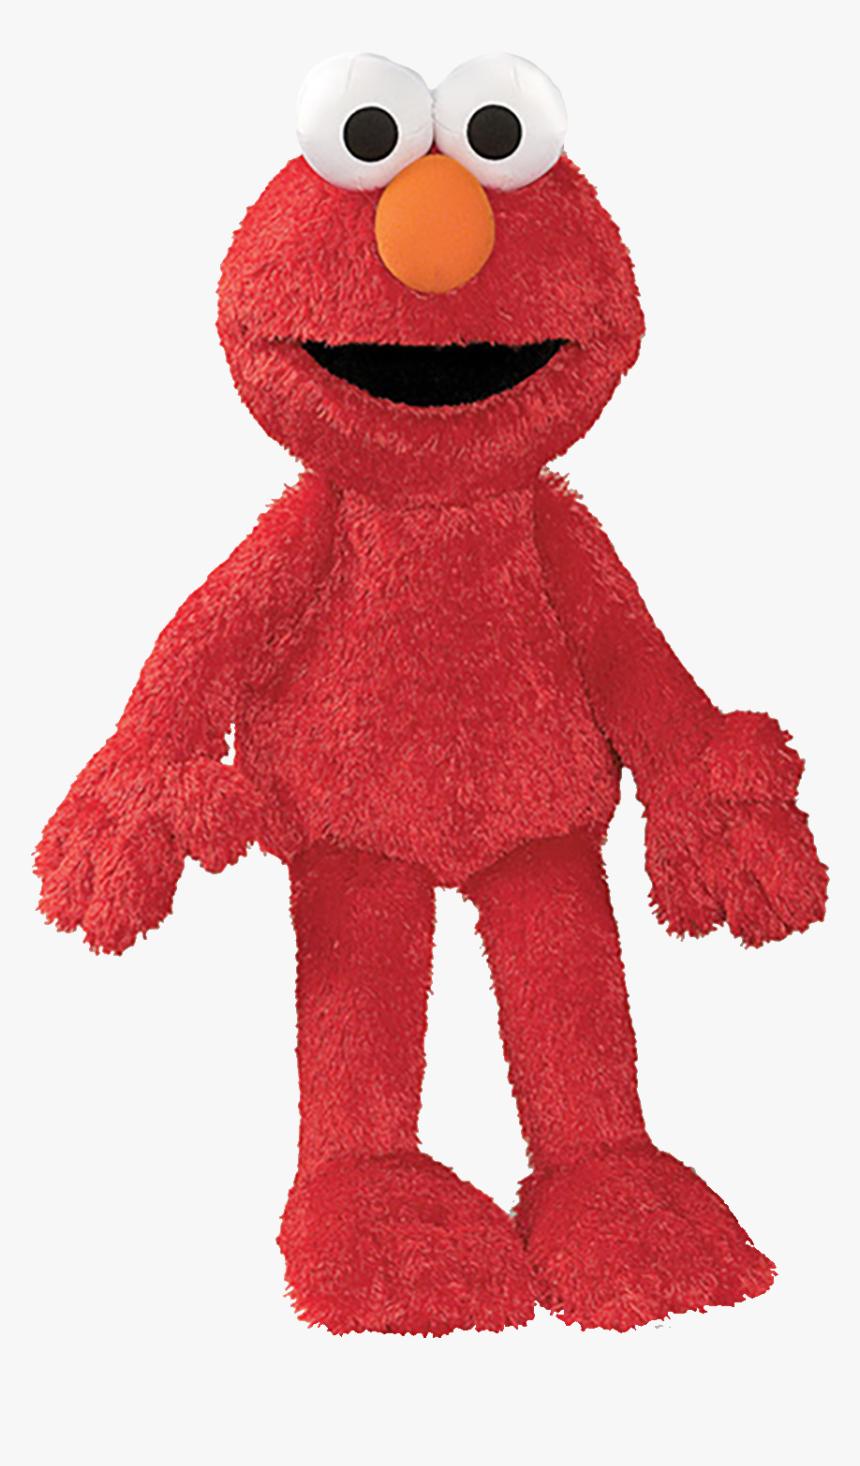 Anthonythepepsifan Roblox Wikia - Sesame Street Elmo Plush Toy, HD Png Download, Free Download